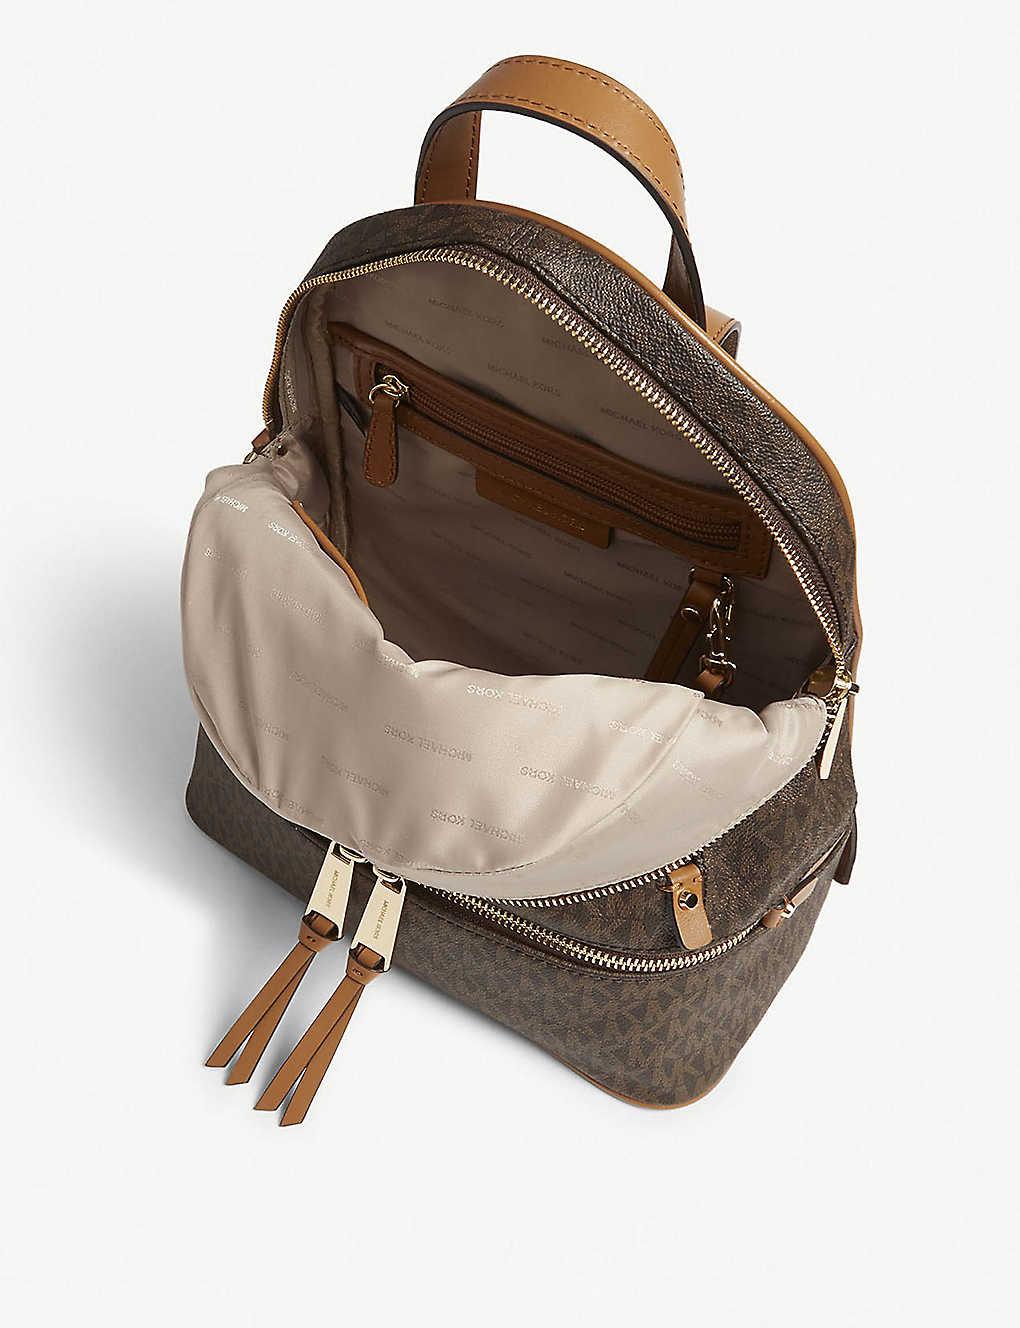 363deeddc1e0 MICHAEL MICHAEL KORS - Rhea medium leather backpack | Selfridges.com